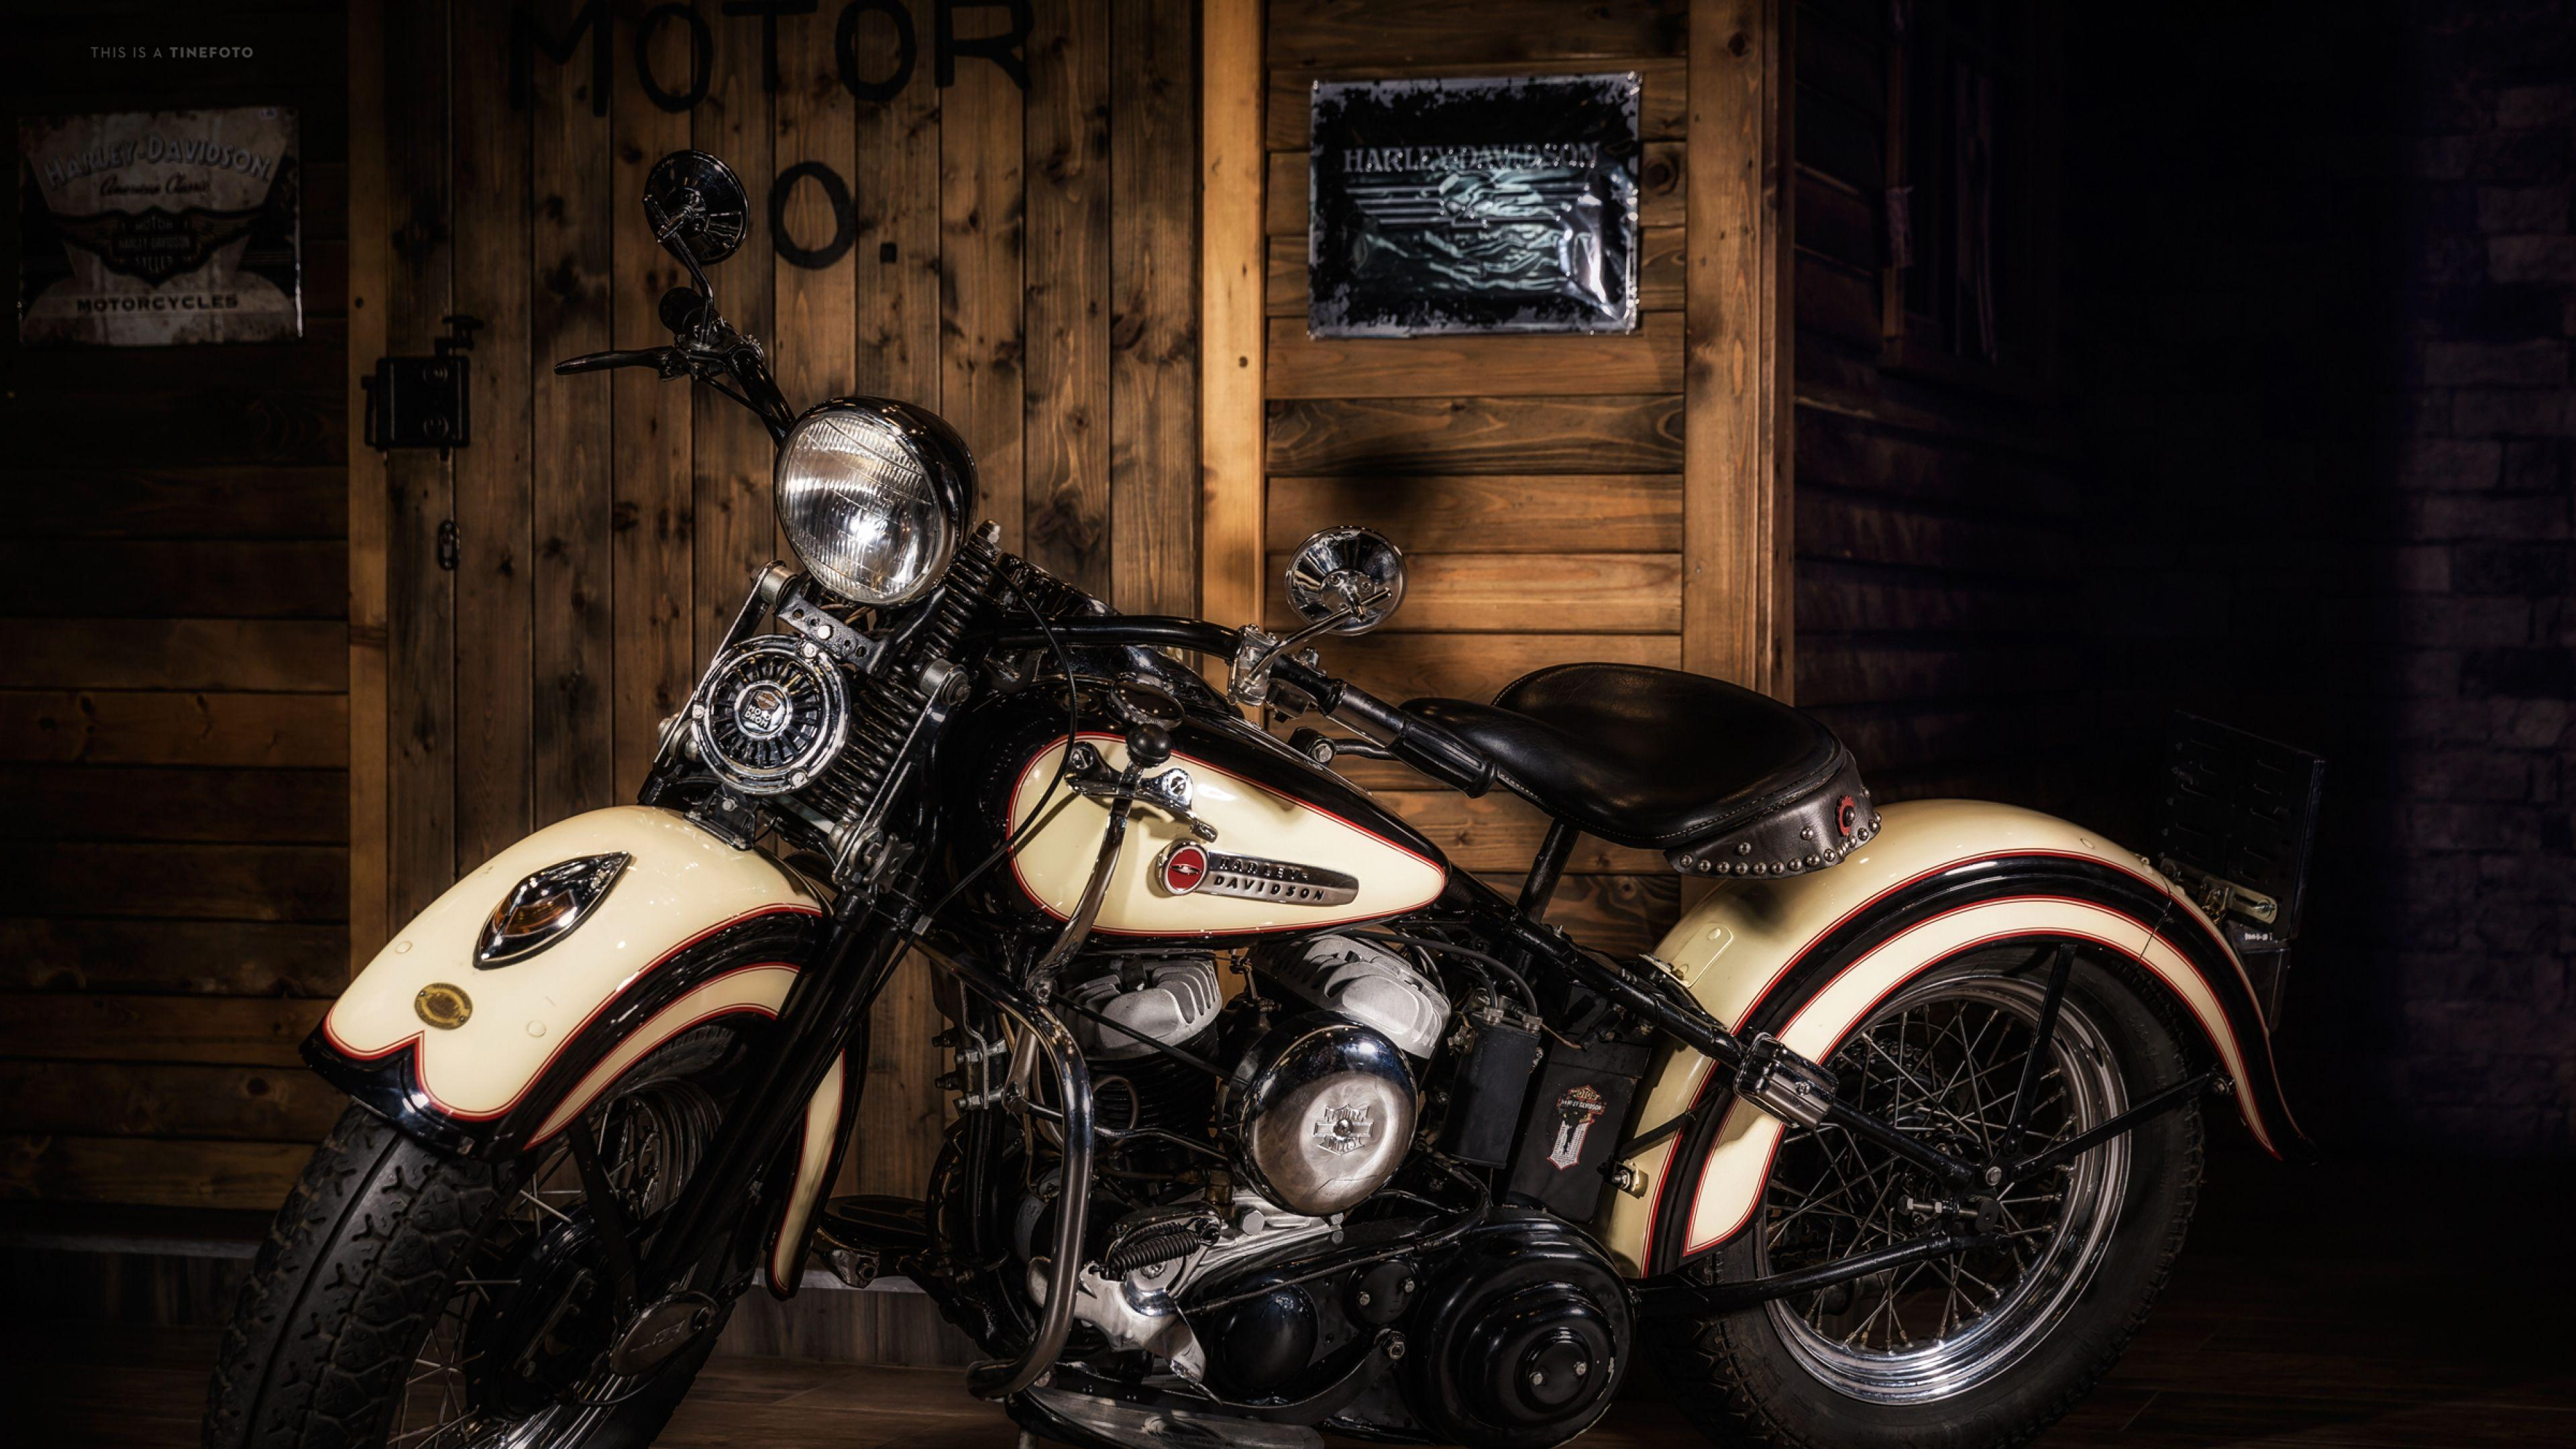 Wallpapers Harley Davidson Wallpaper Cave